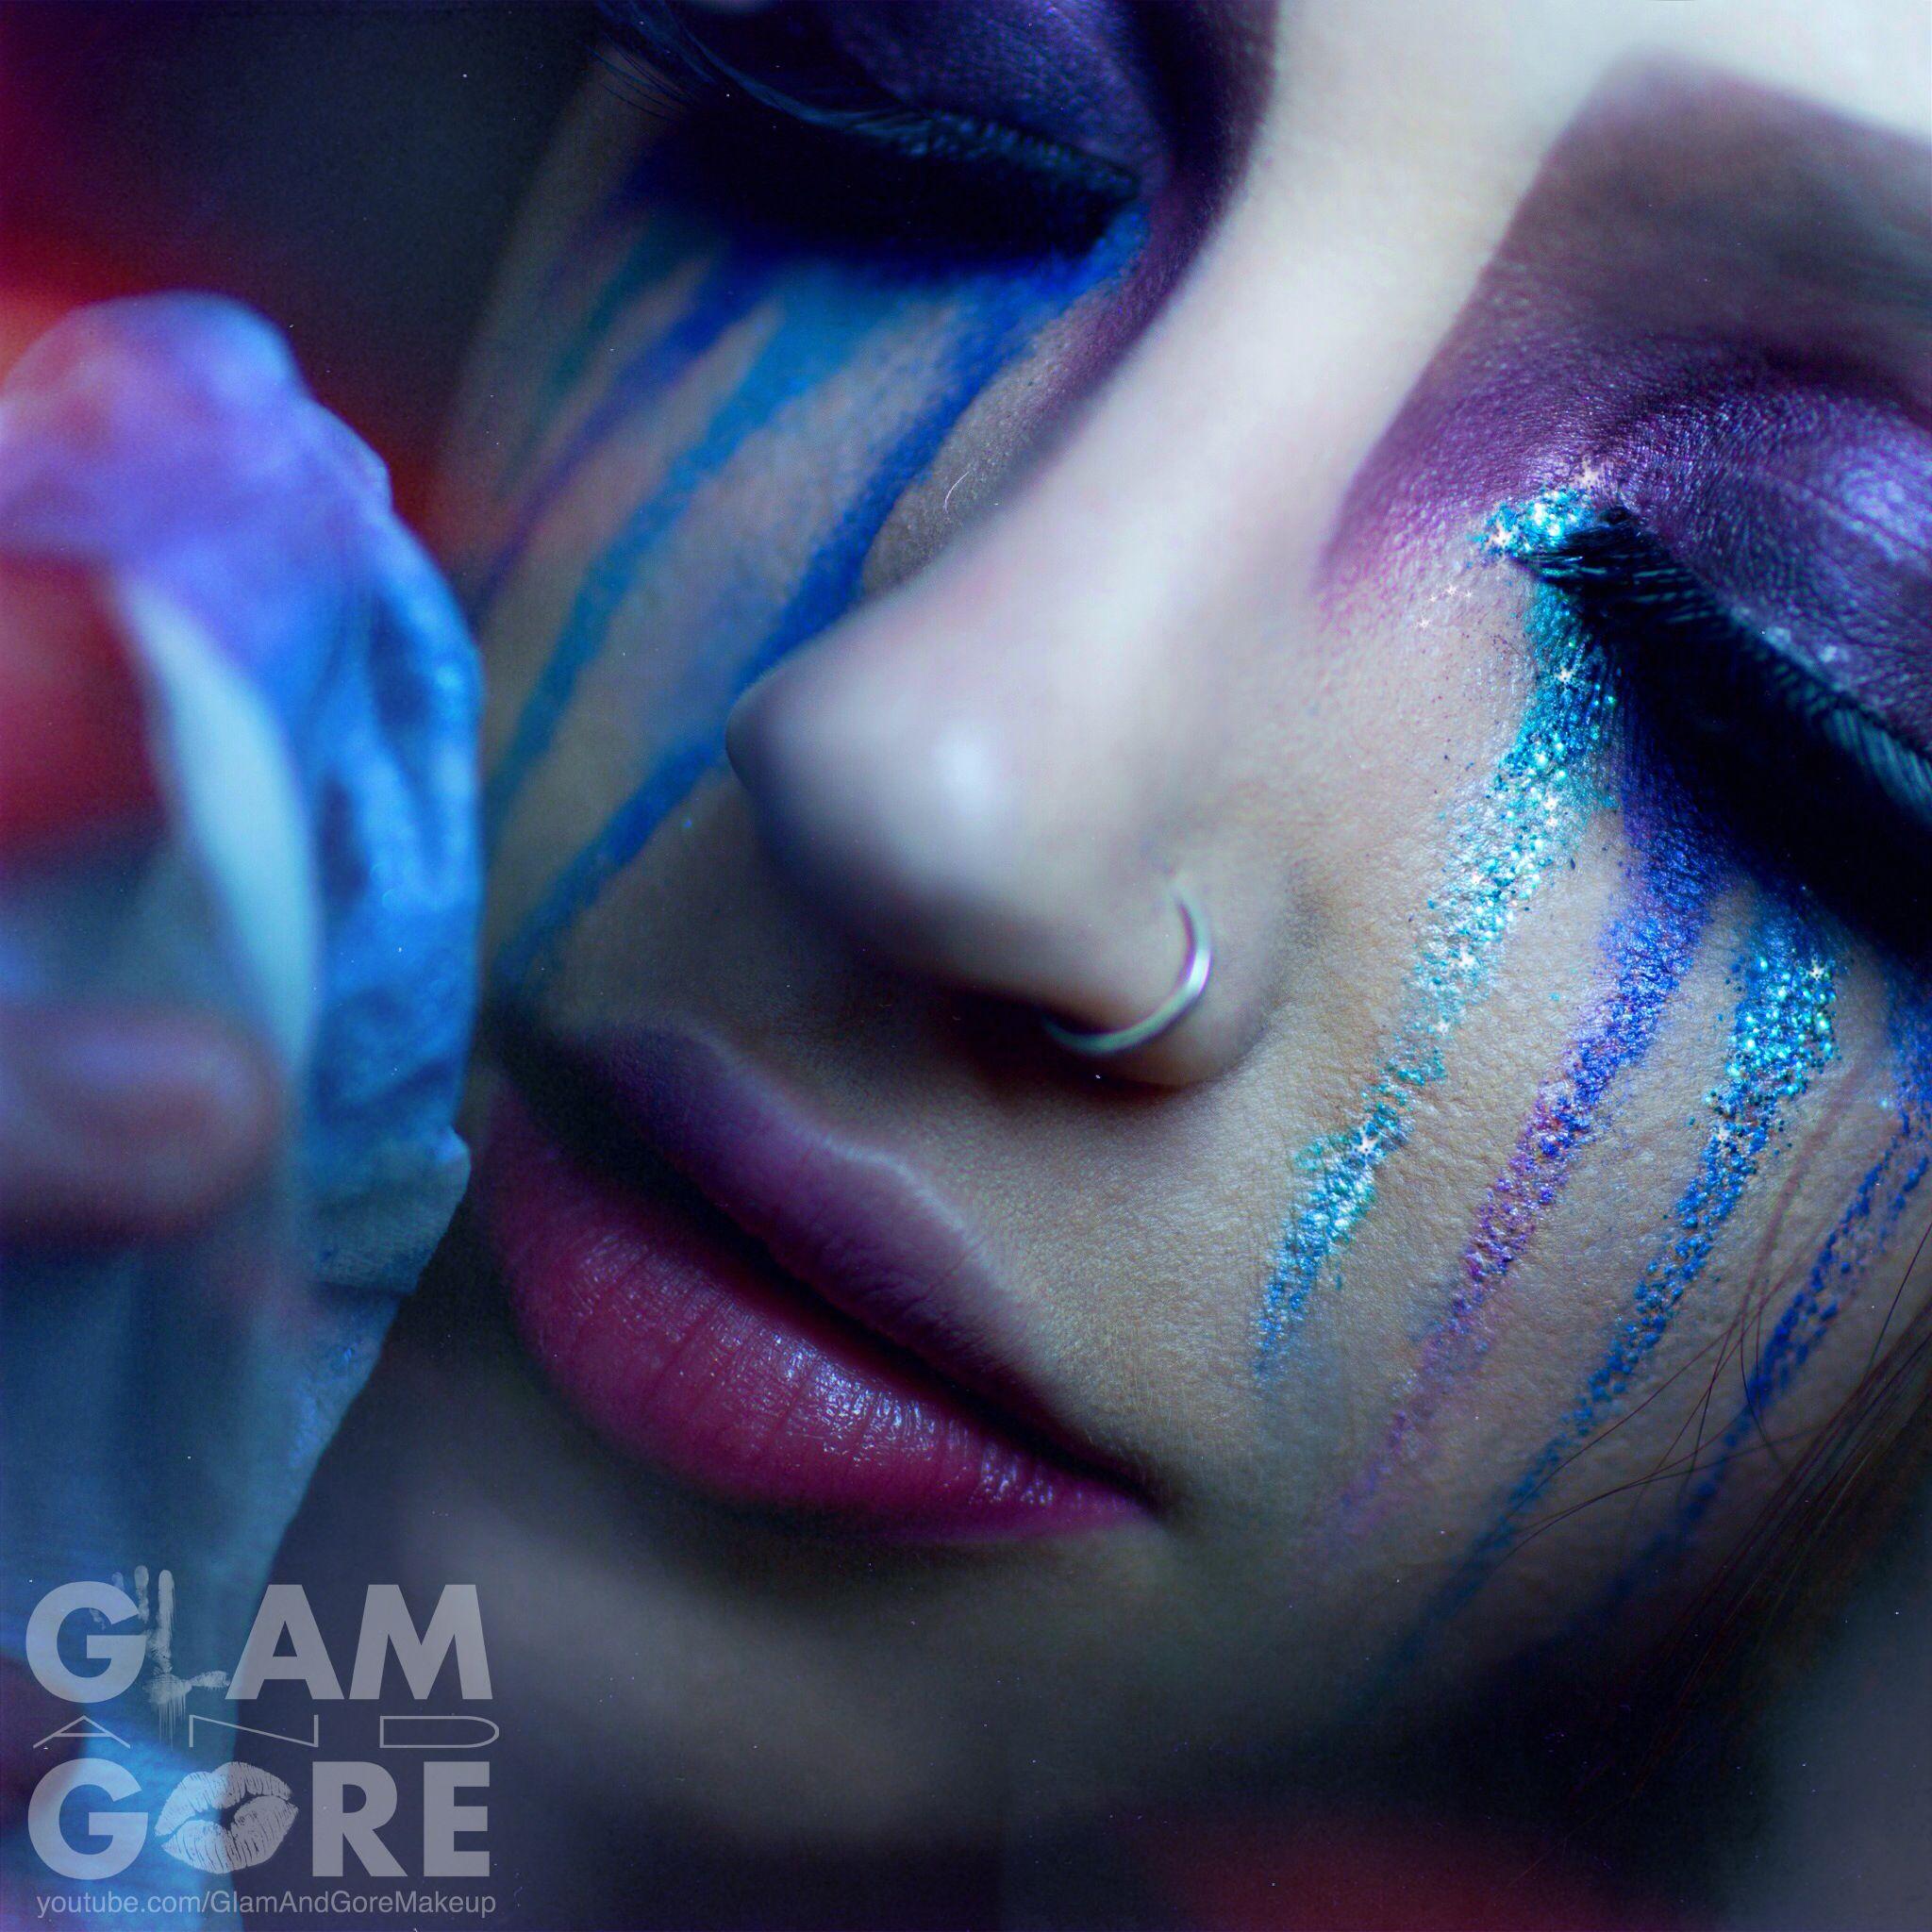 explore halloween makeup halloween crafts and more - Youtube Halloween Crafts